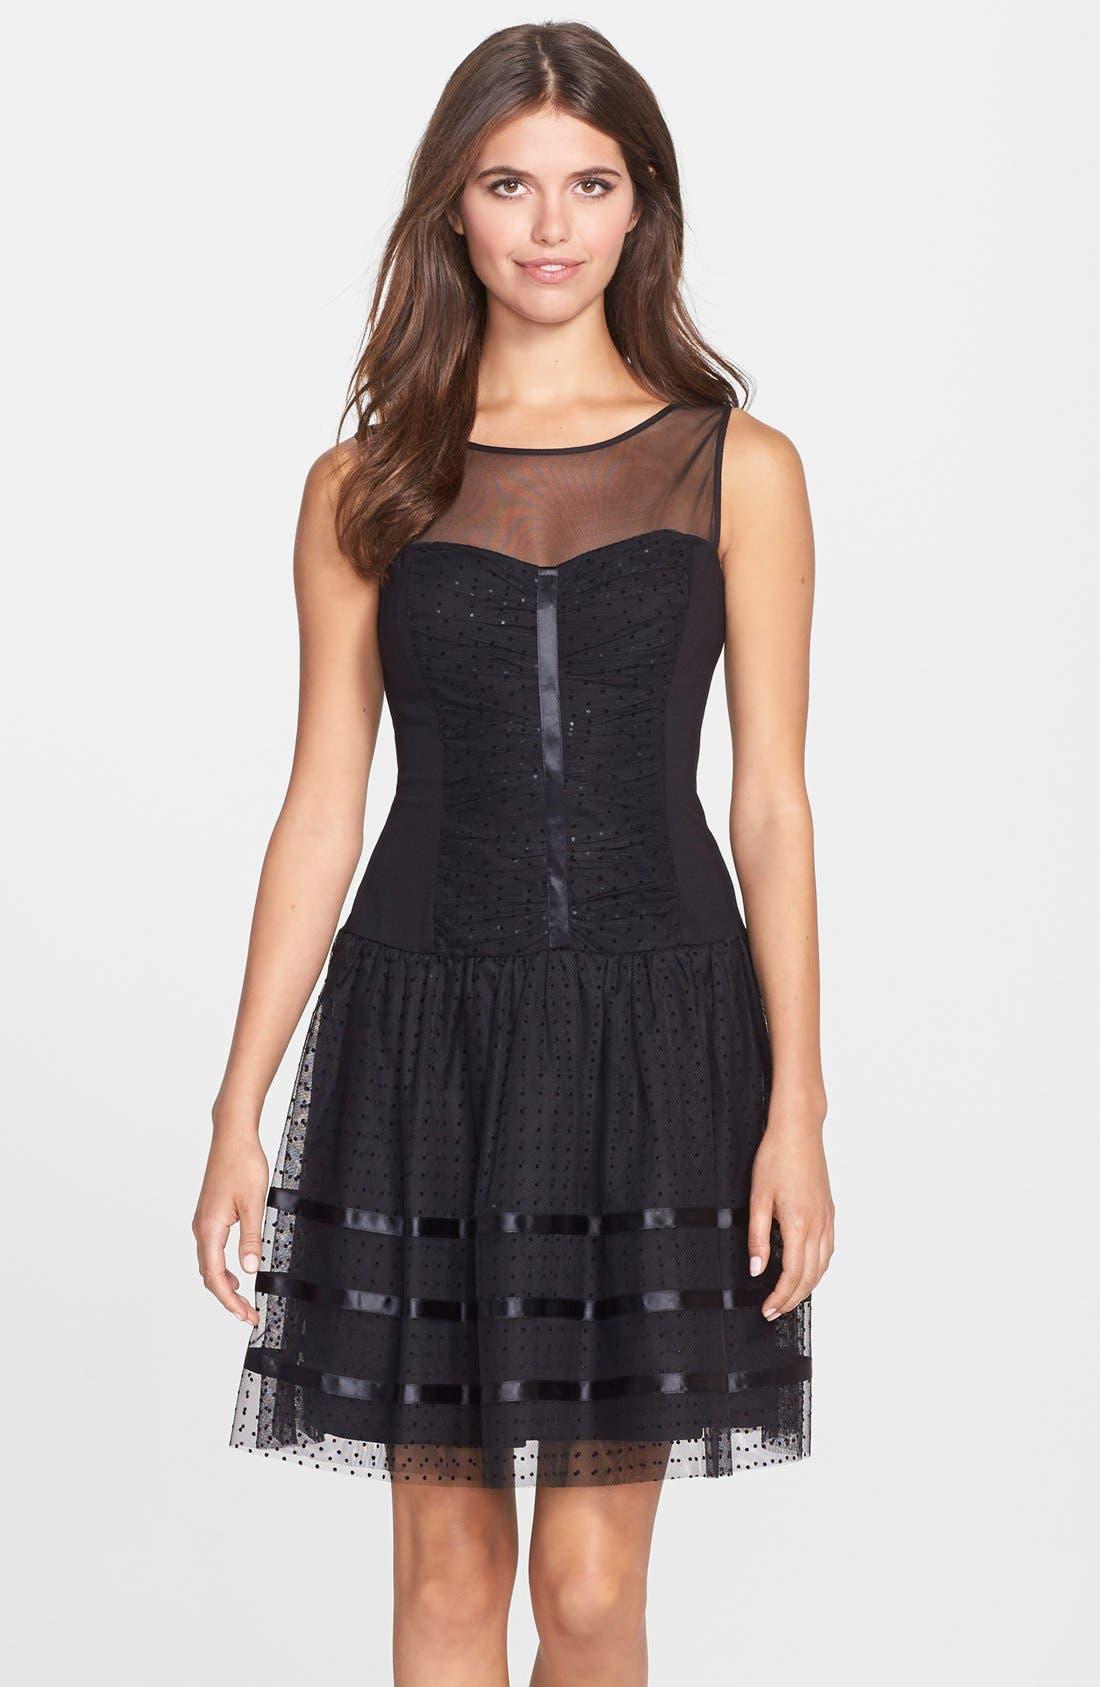 Alternate Image 1 Selected - Betsey Johnson Illusion Yoke Dot Mesh Fit & Flare Dress